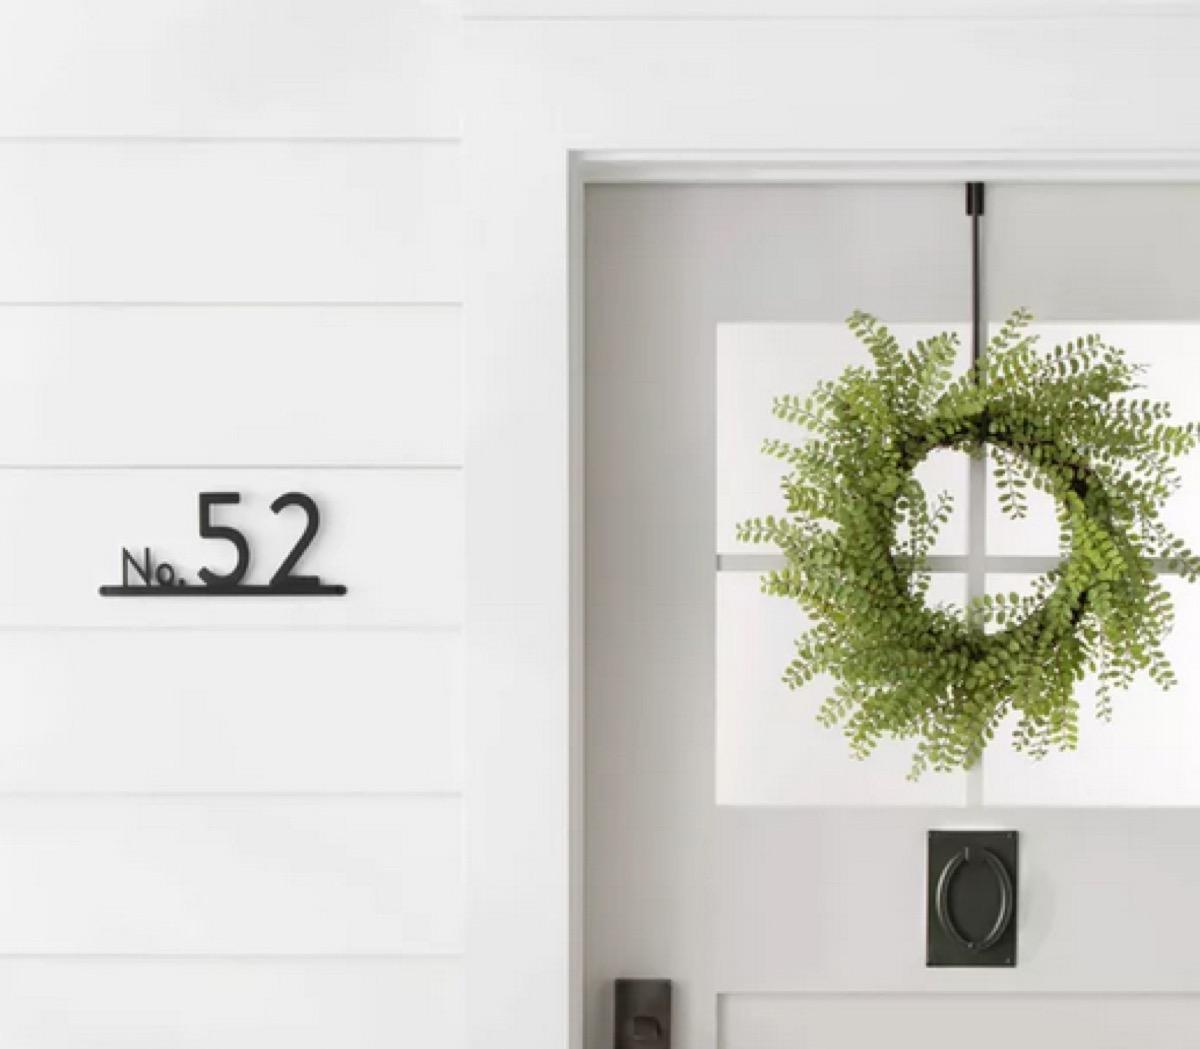 Modern farm house numbers